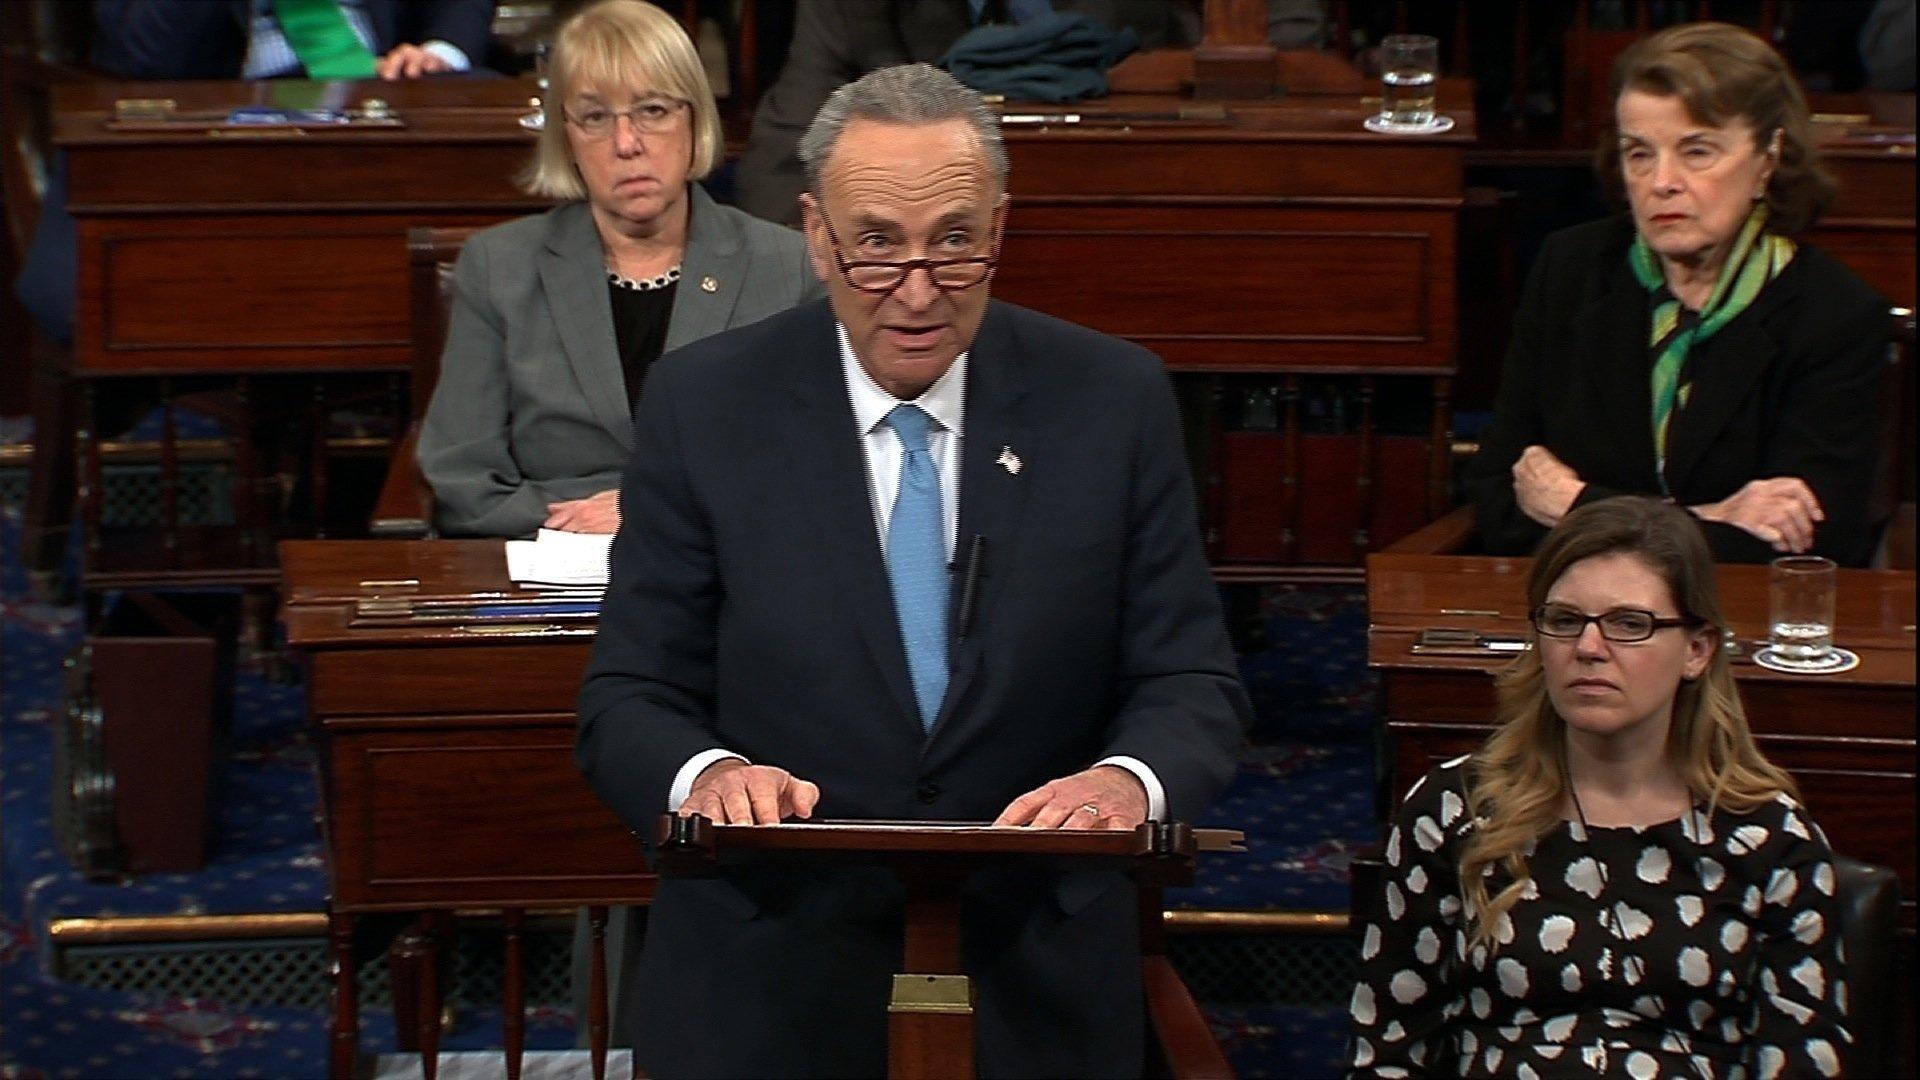 U.S. federal govt shuts down over budget row